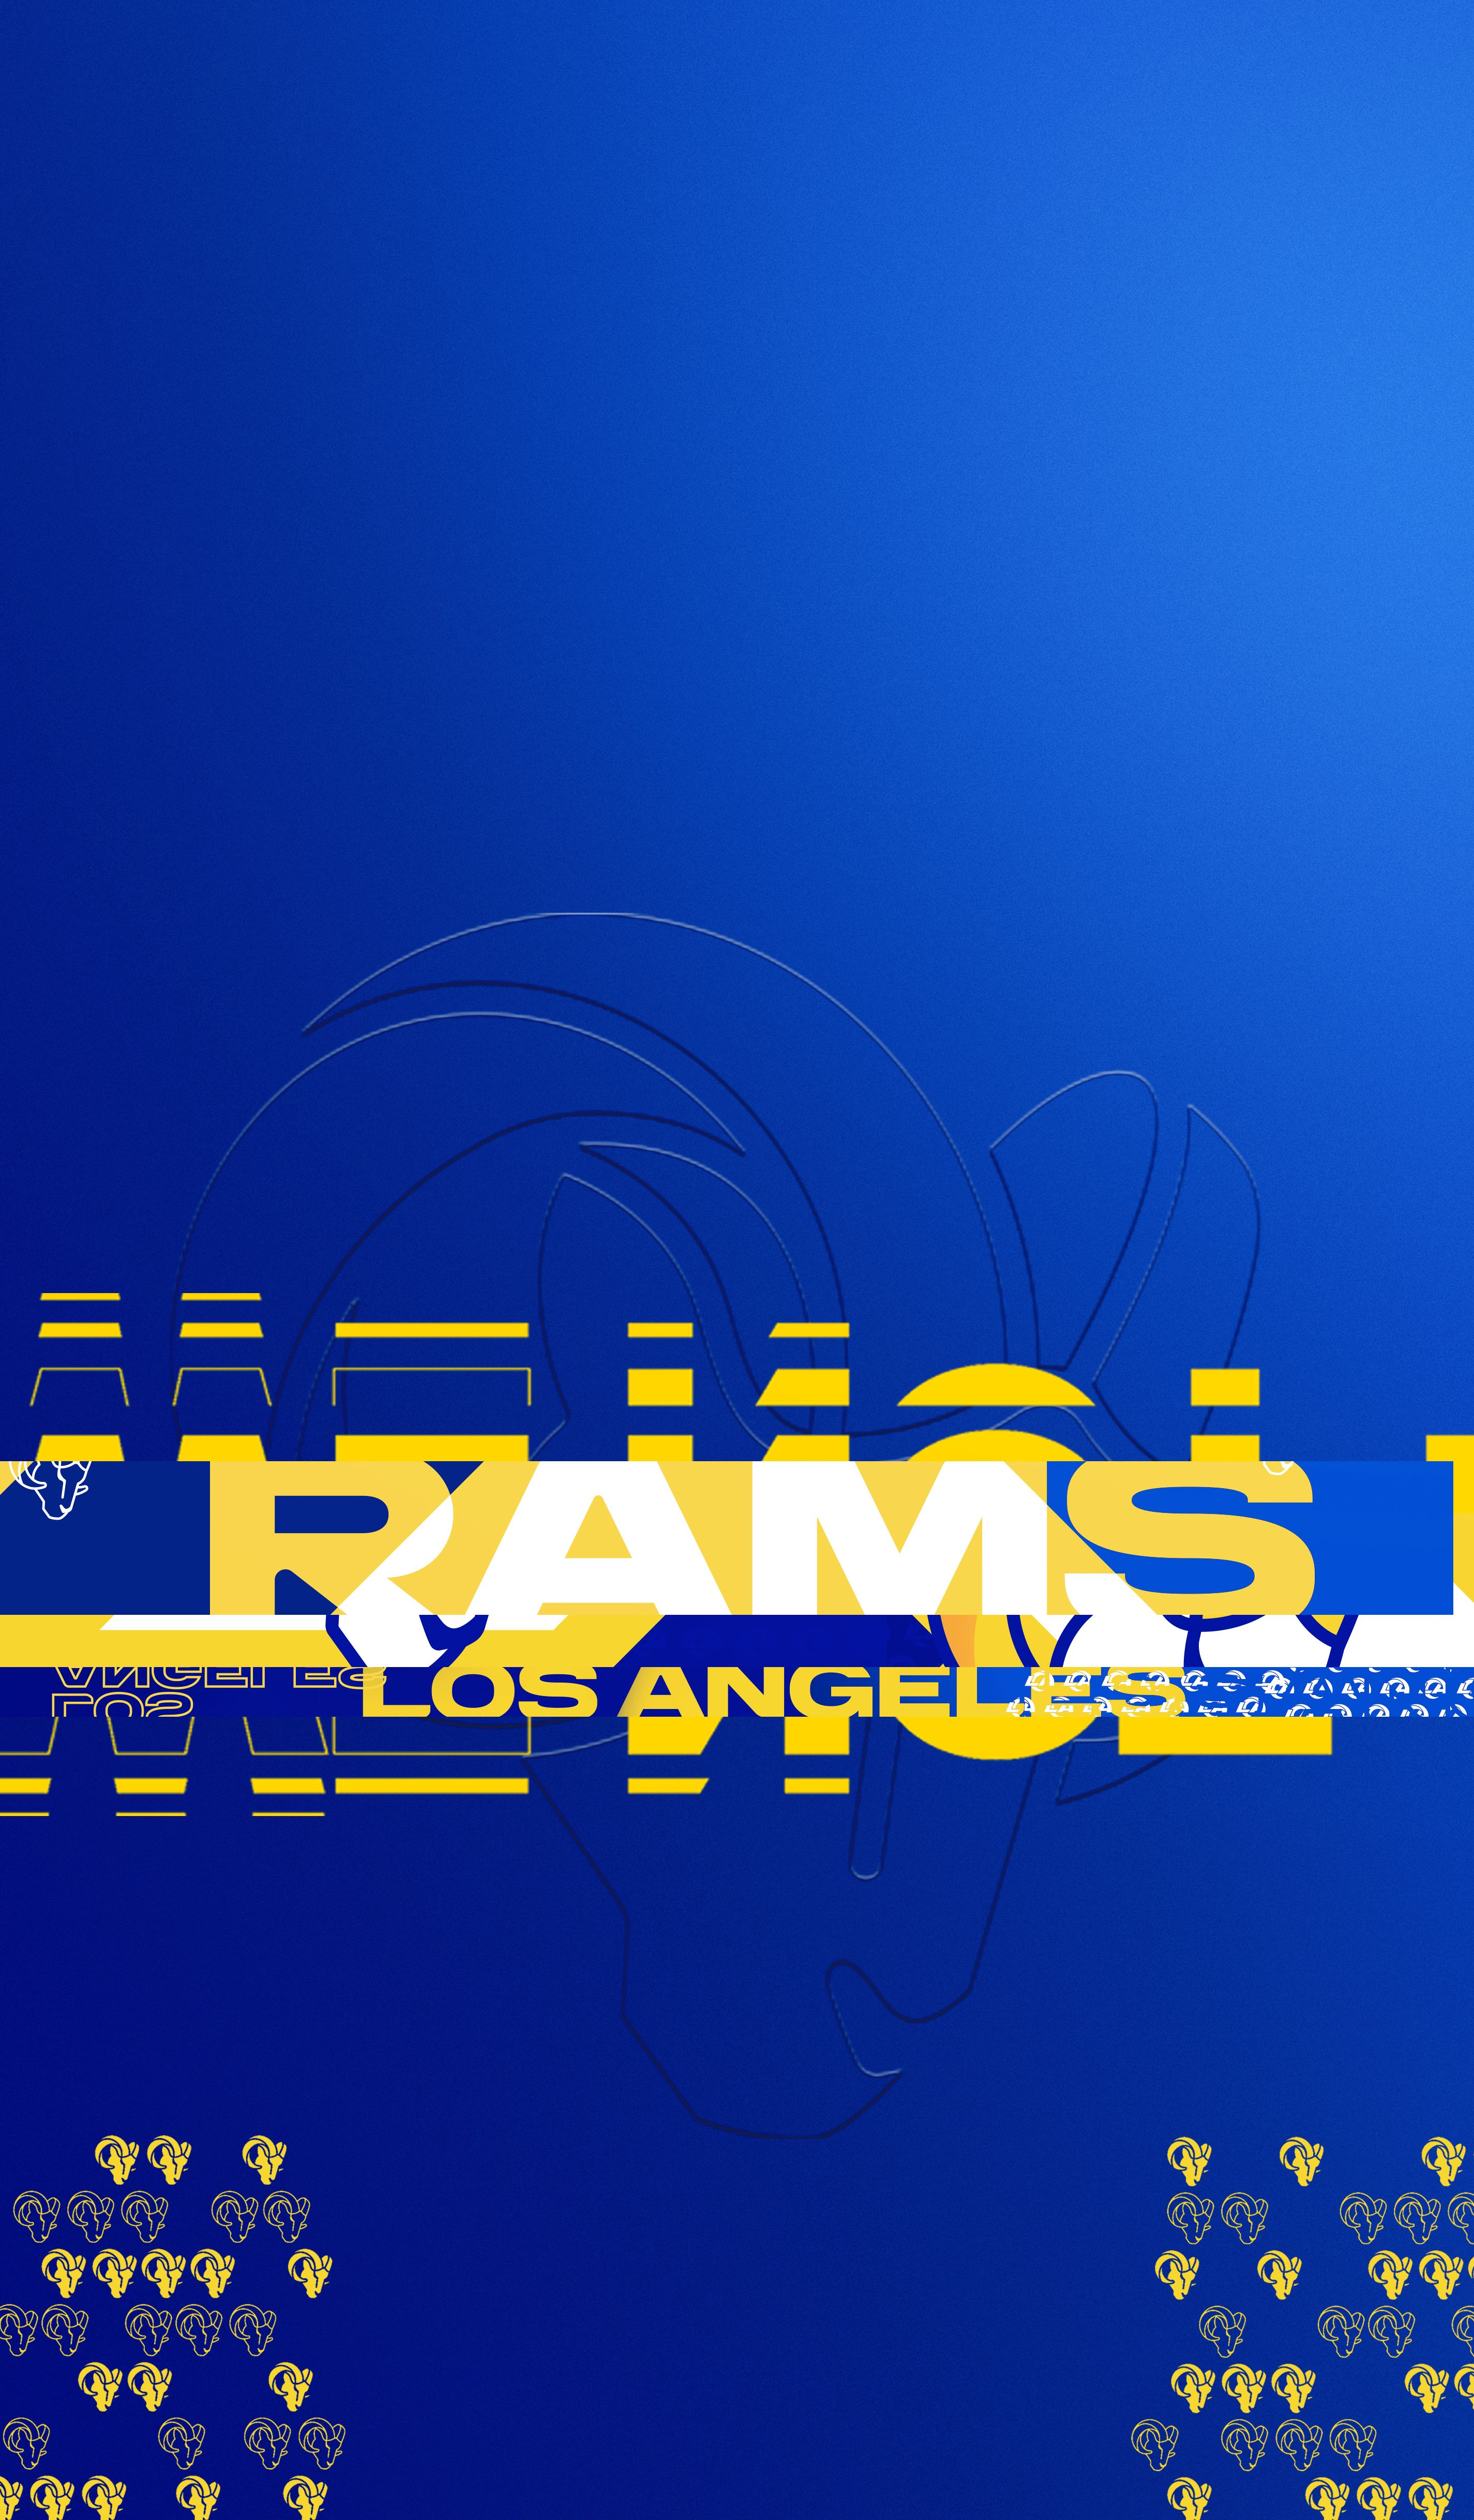 Rams Wallpapers Los Angeles Rams   theramscom 2850x4872